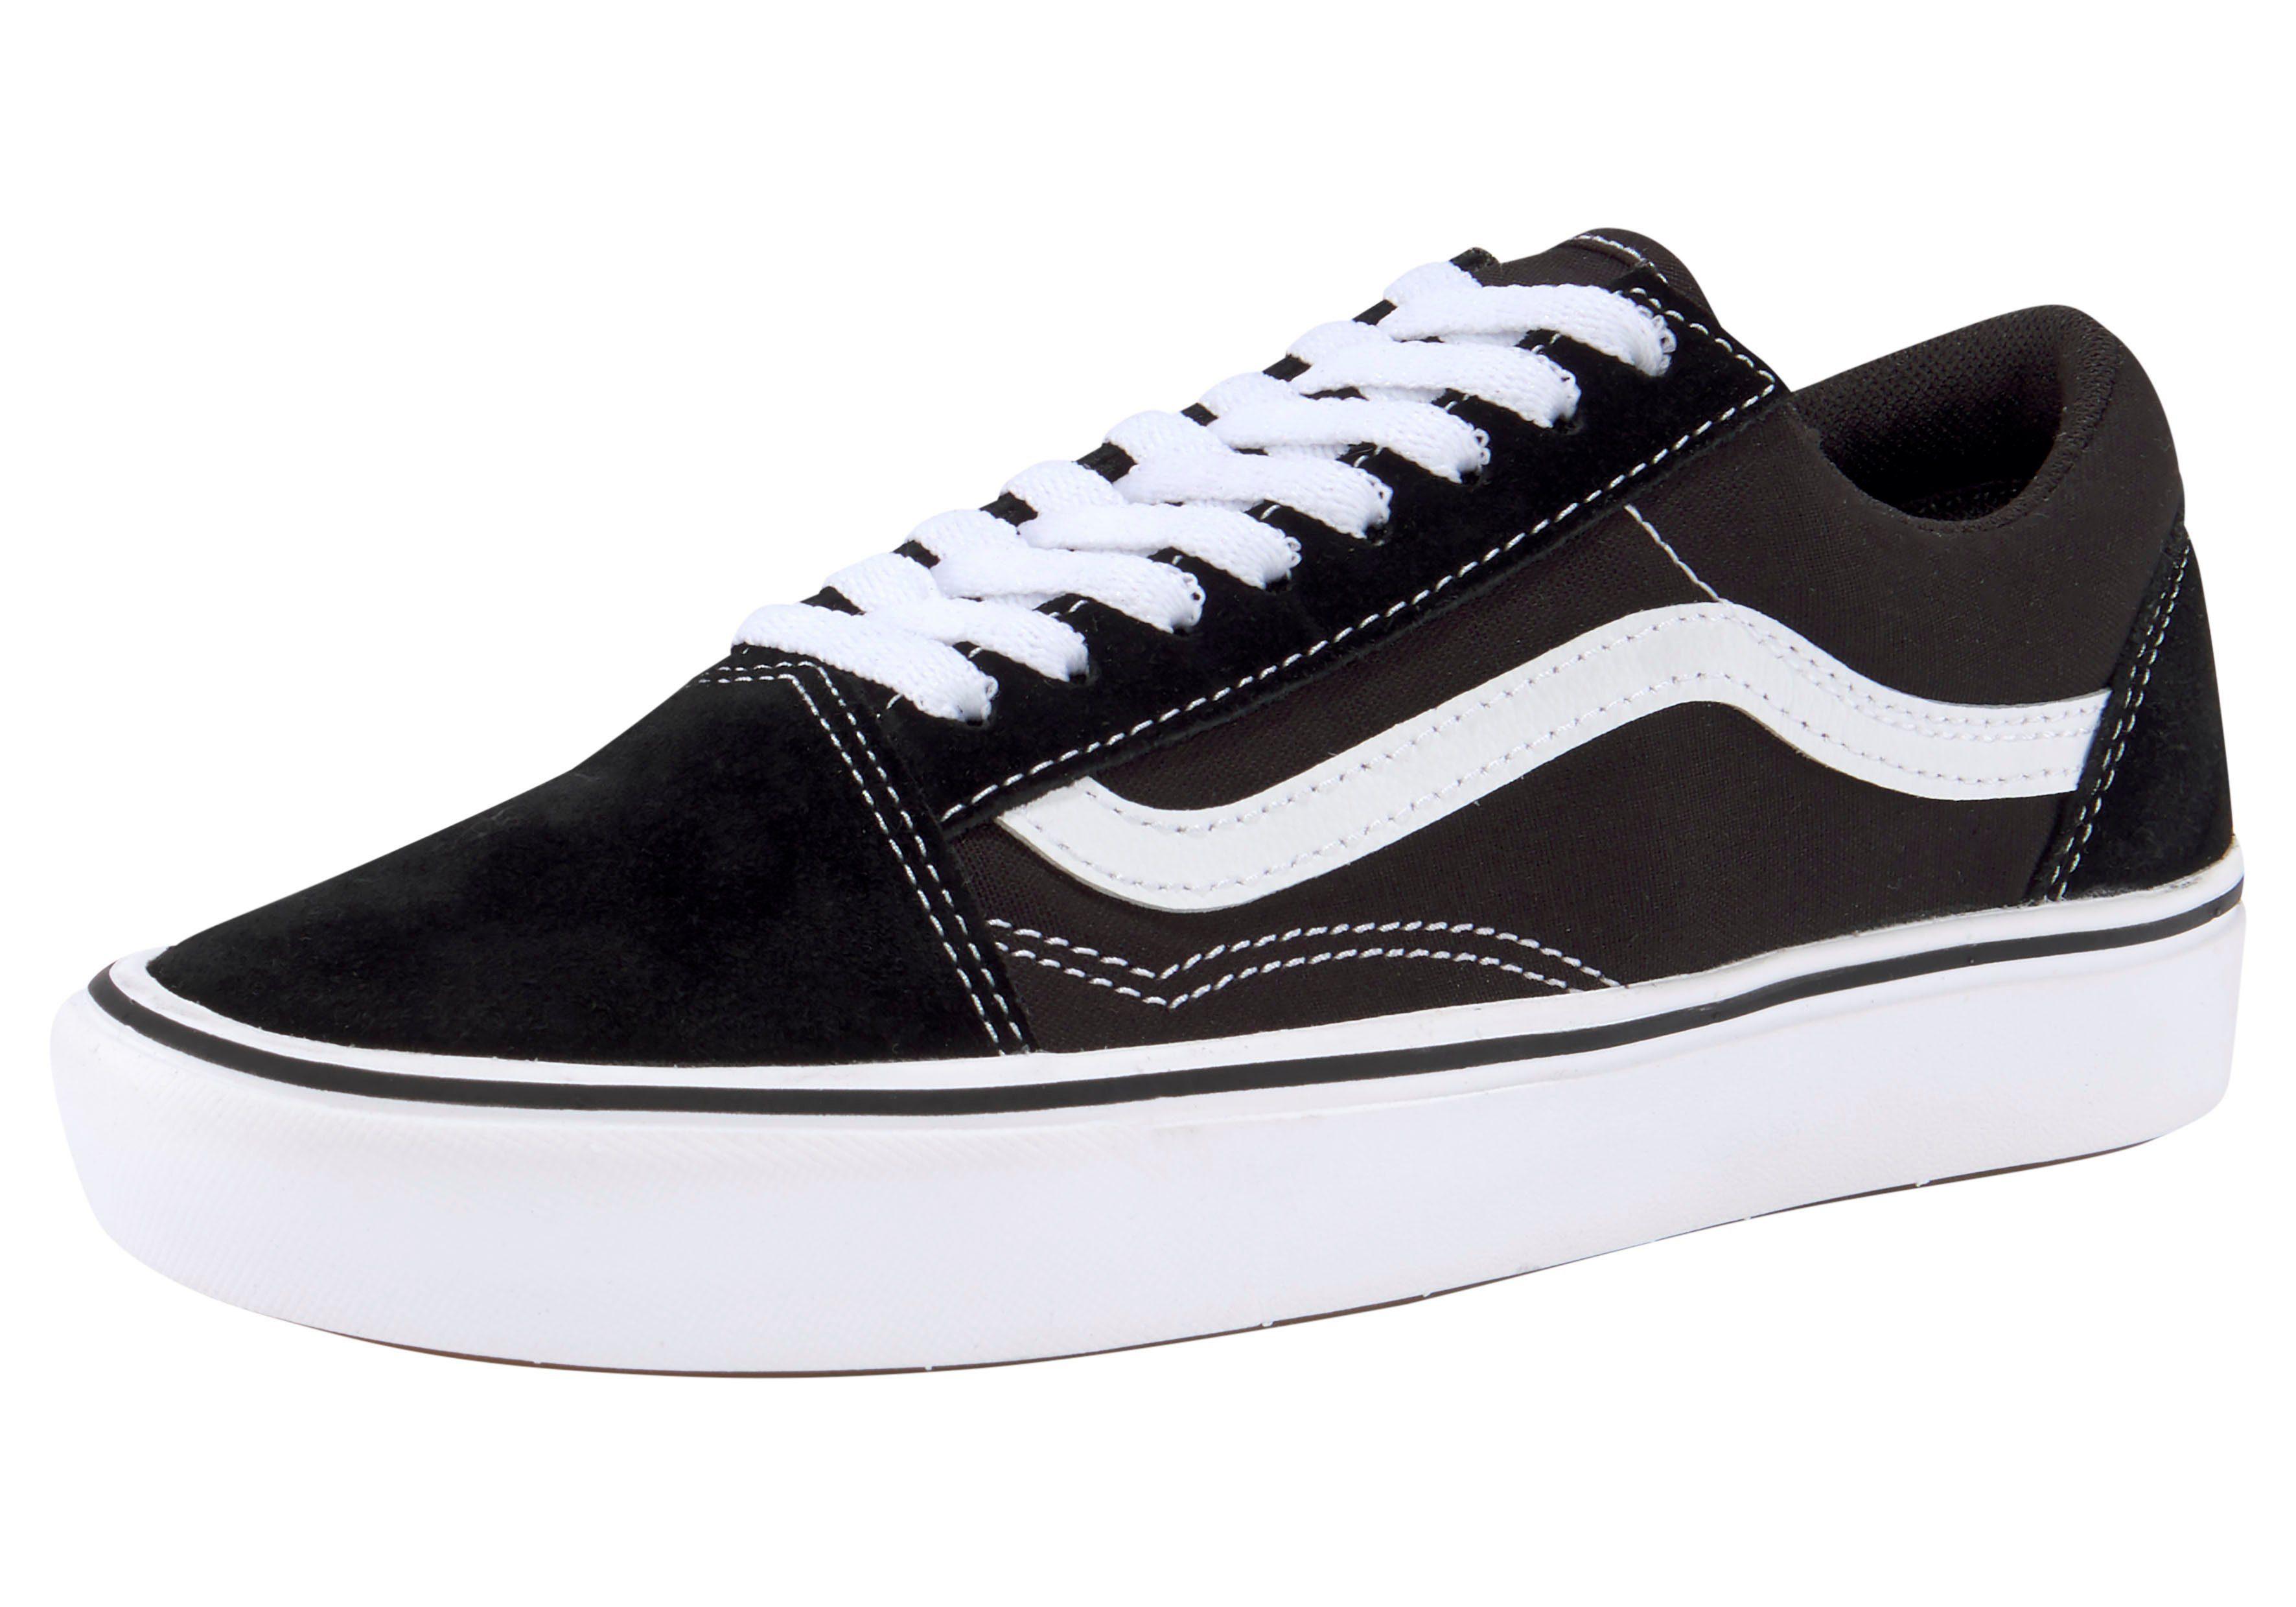 Vans »ComfyCush Old Skool« Sneaker, Obermaterial aus Textil und Leder online kaufen | OTTO